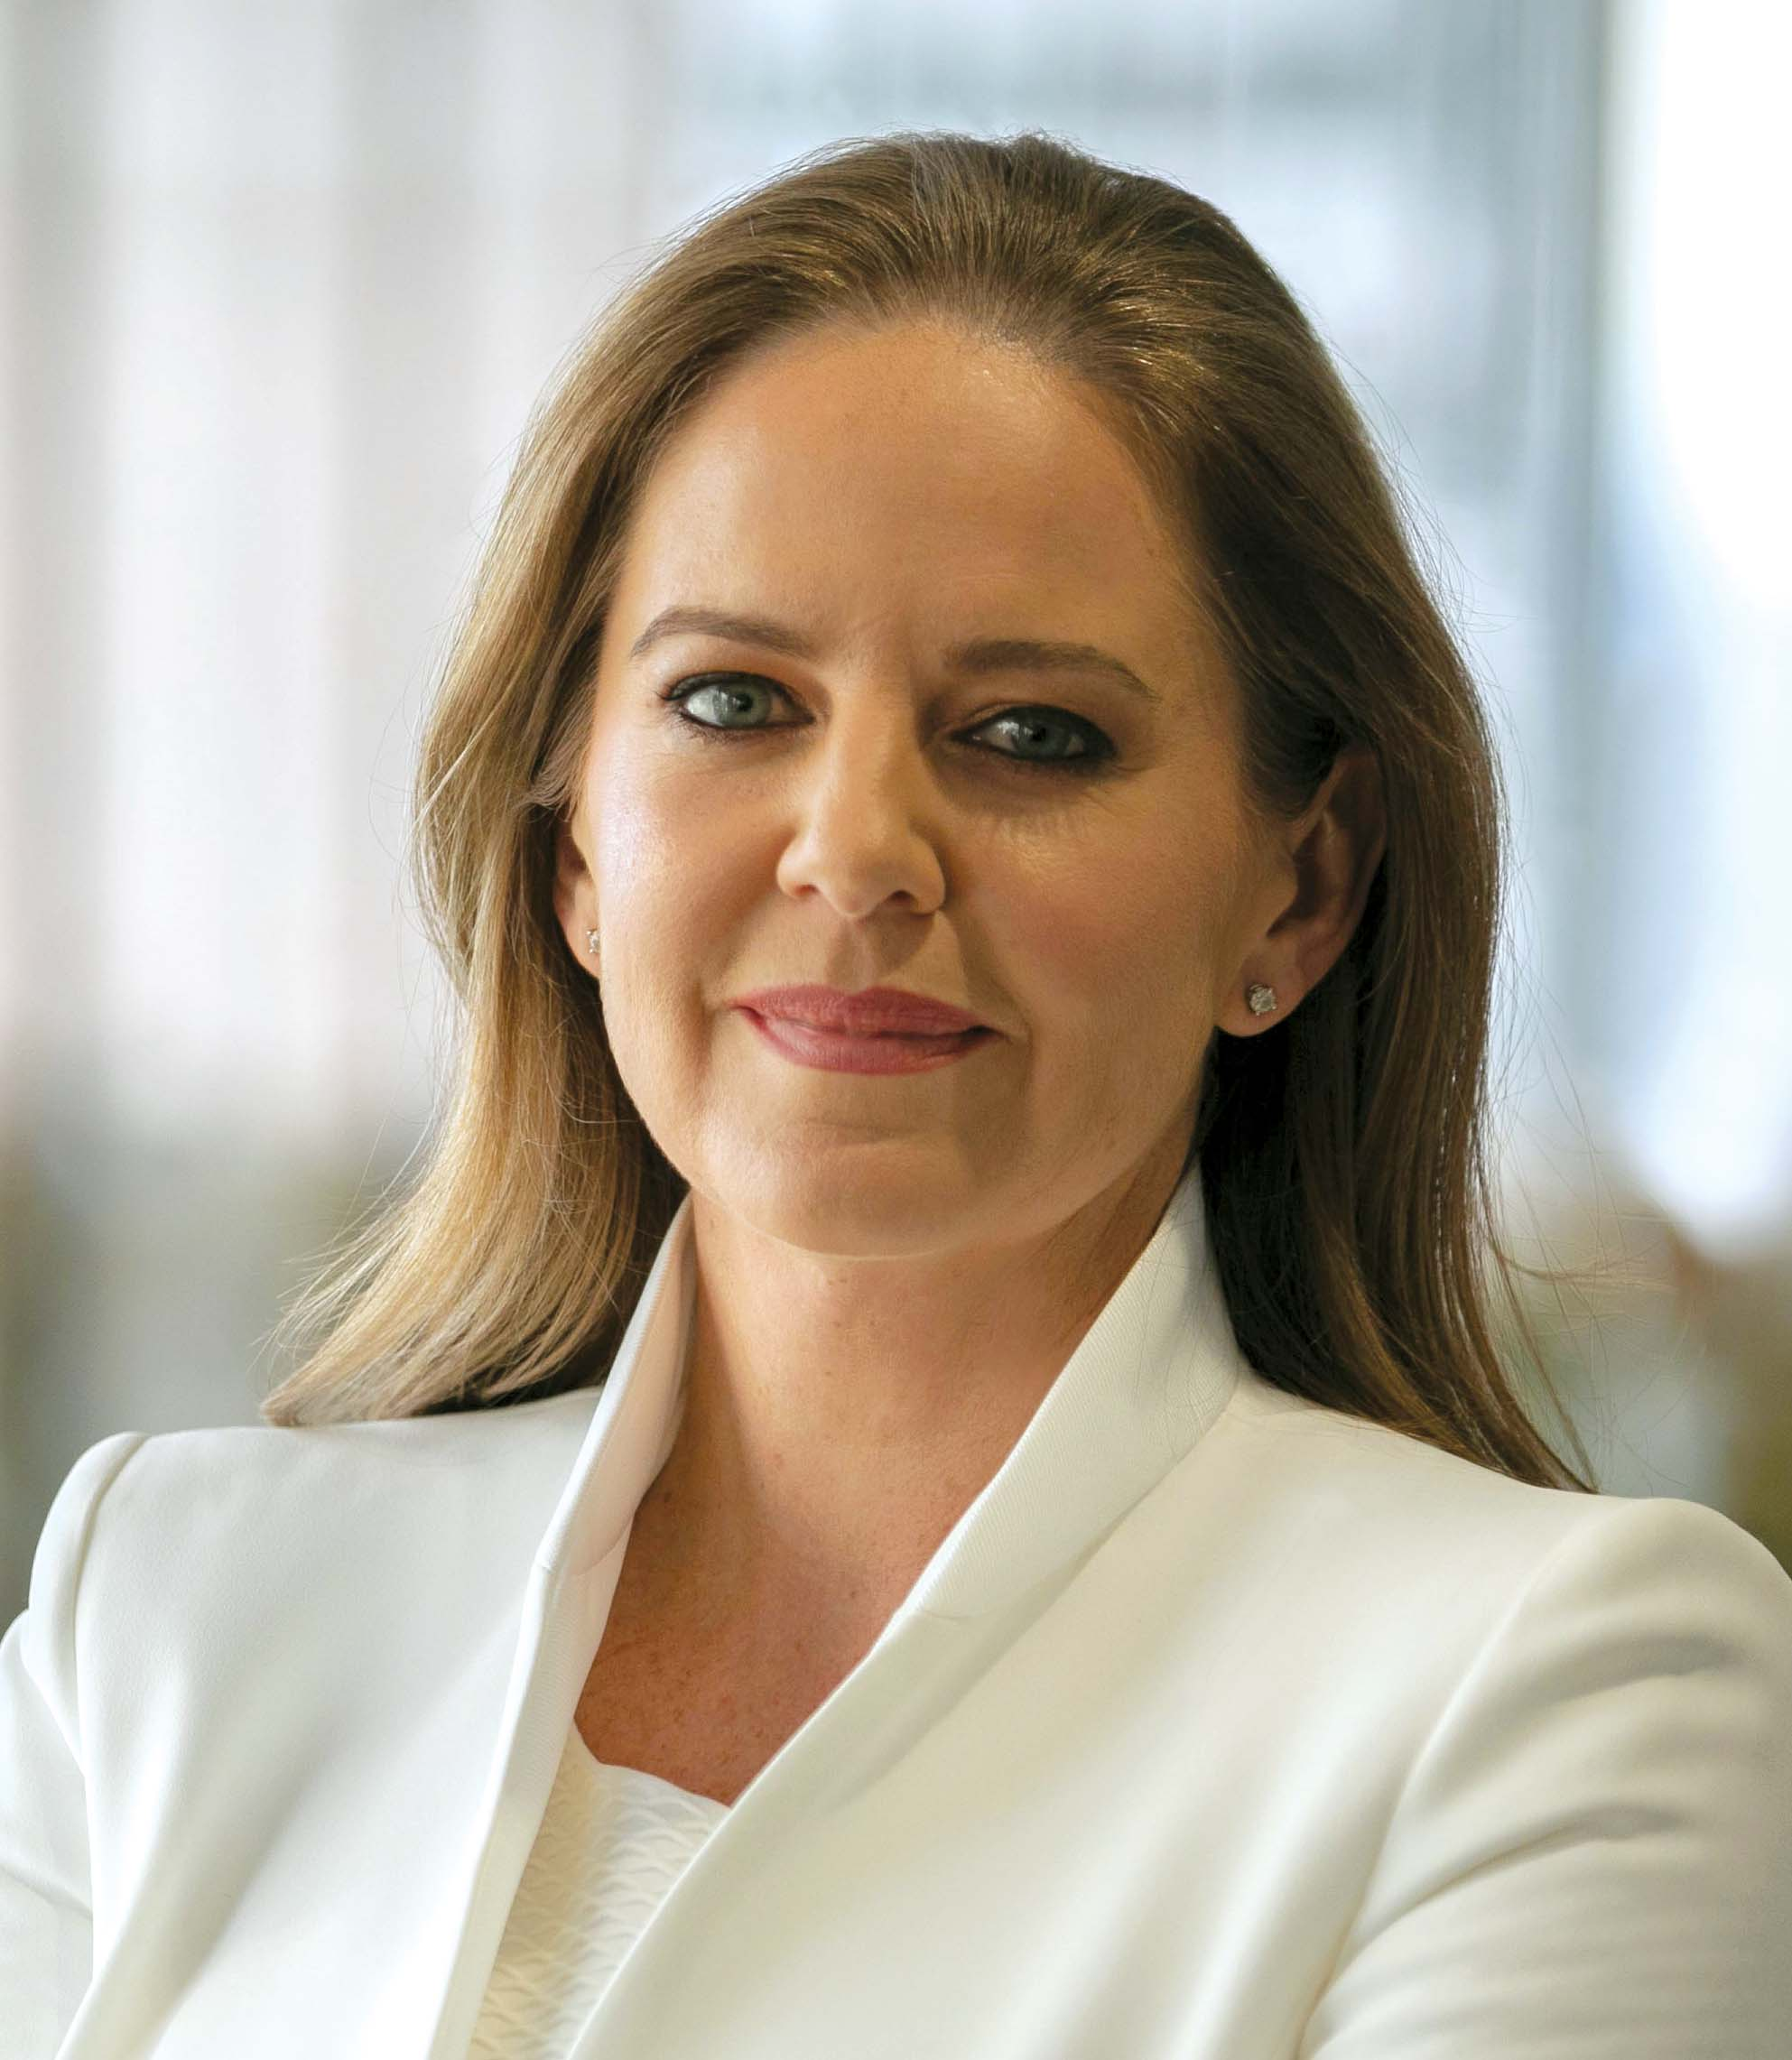 Melanie Evans, ING (Australia)